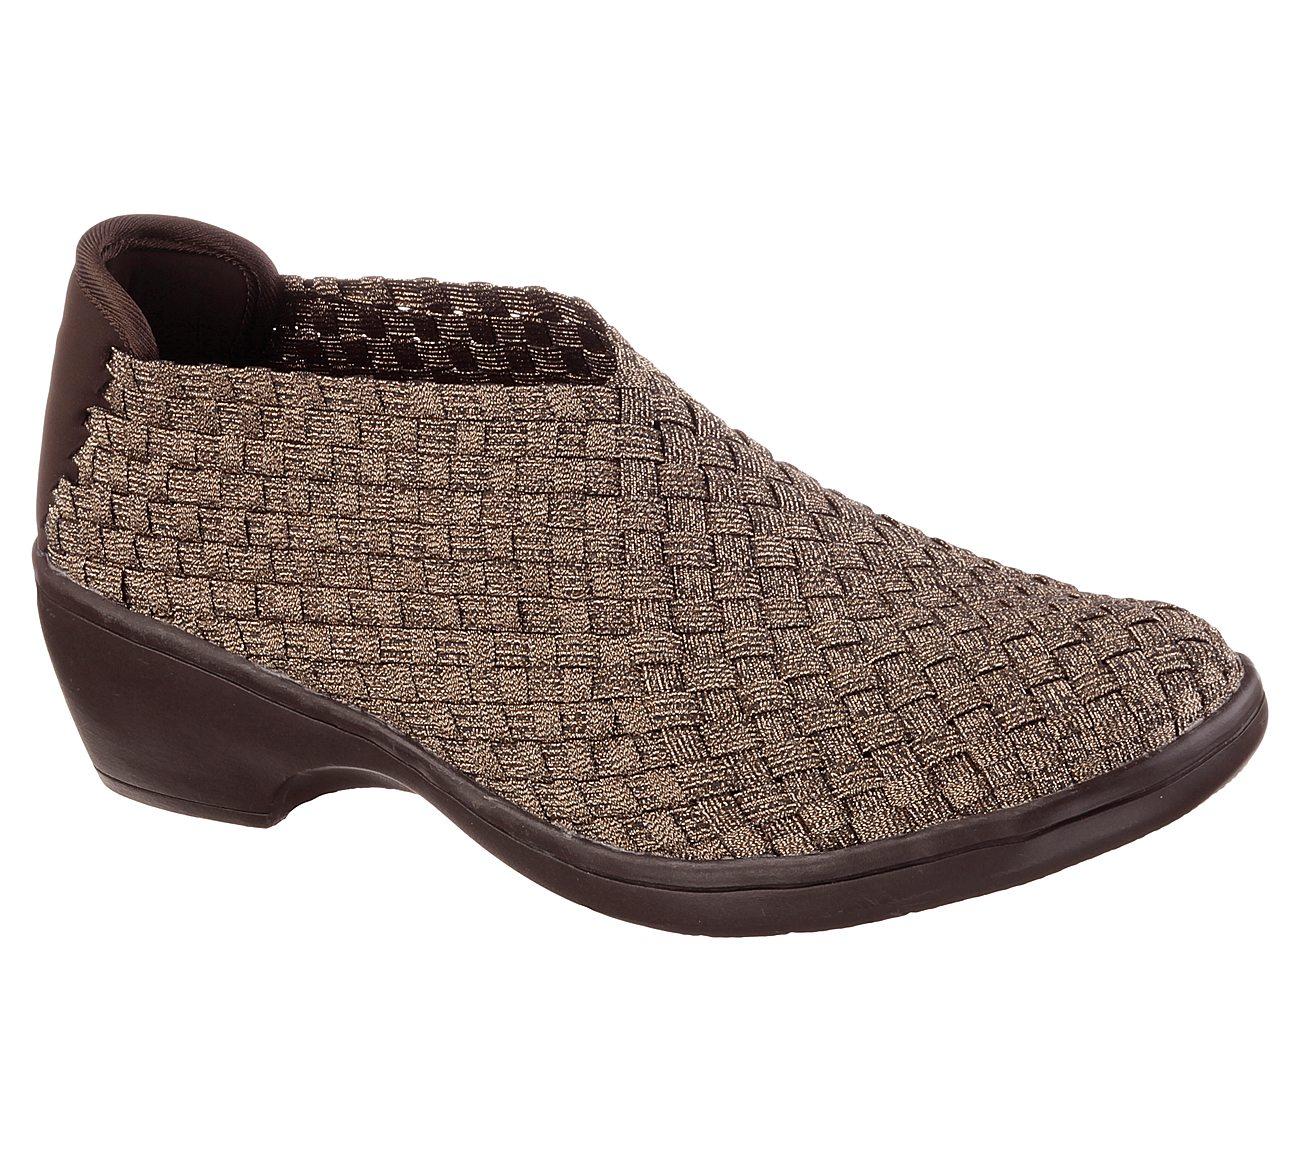 Analítico montar Terminología  skechers woven elastic shoes Sale,up to 51% Discounts